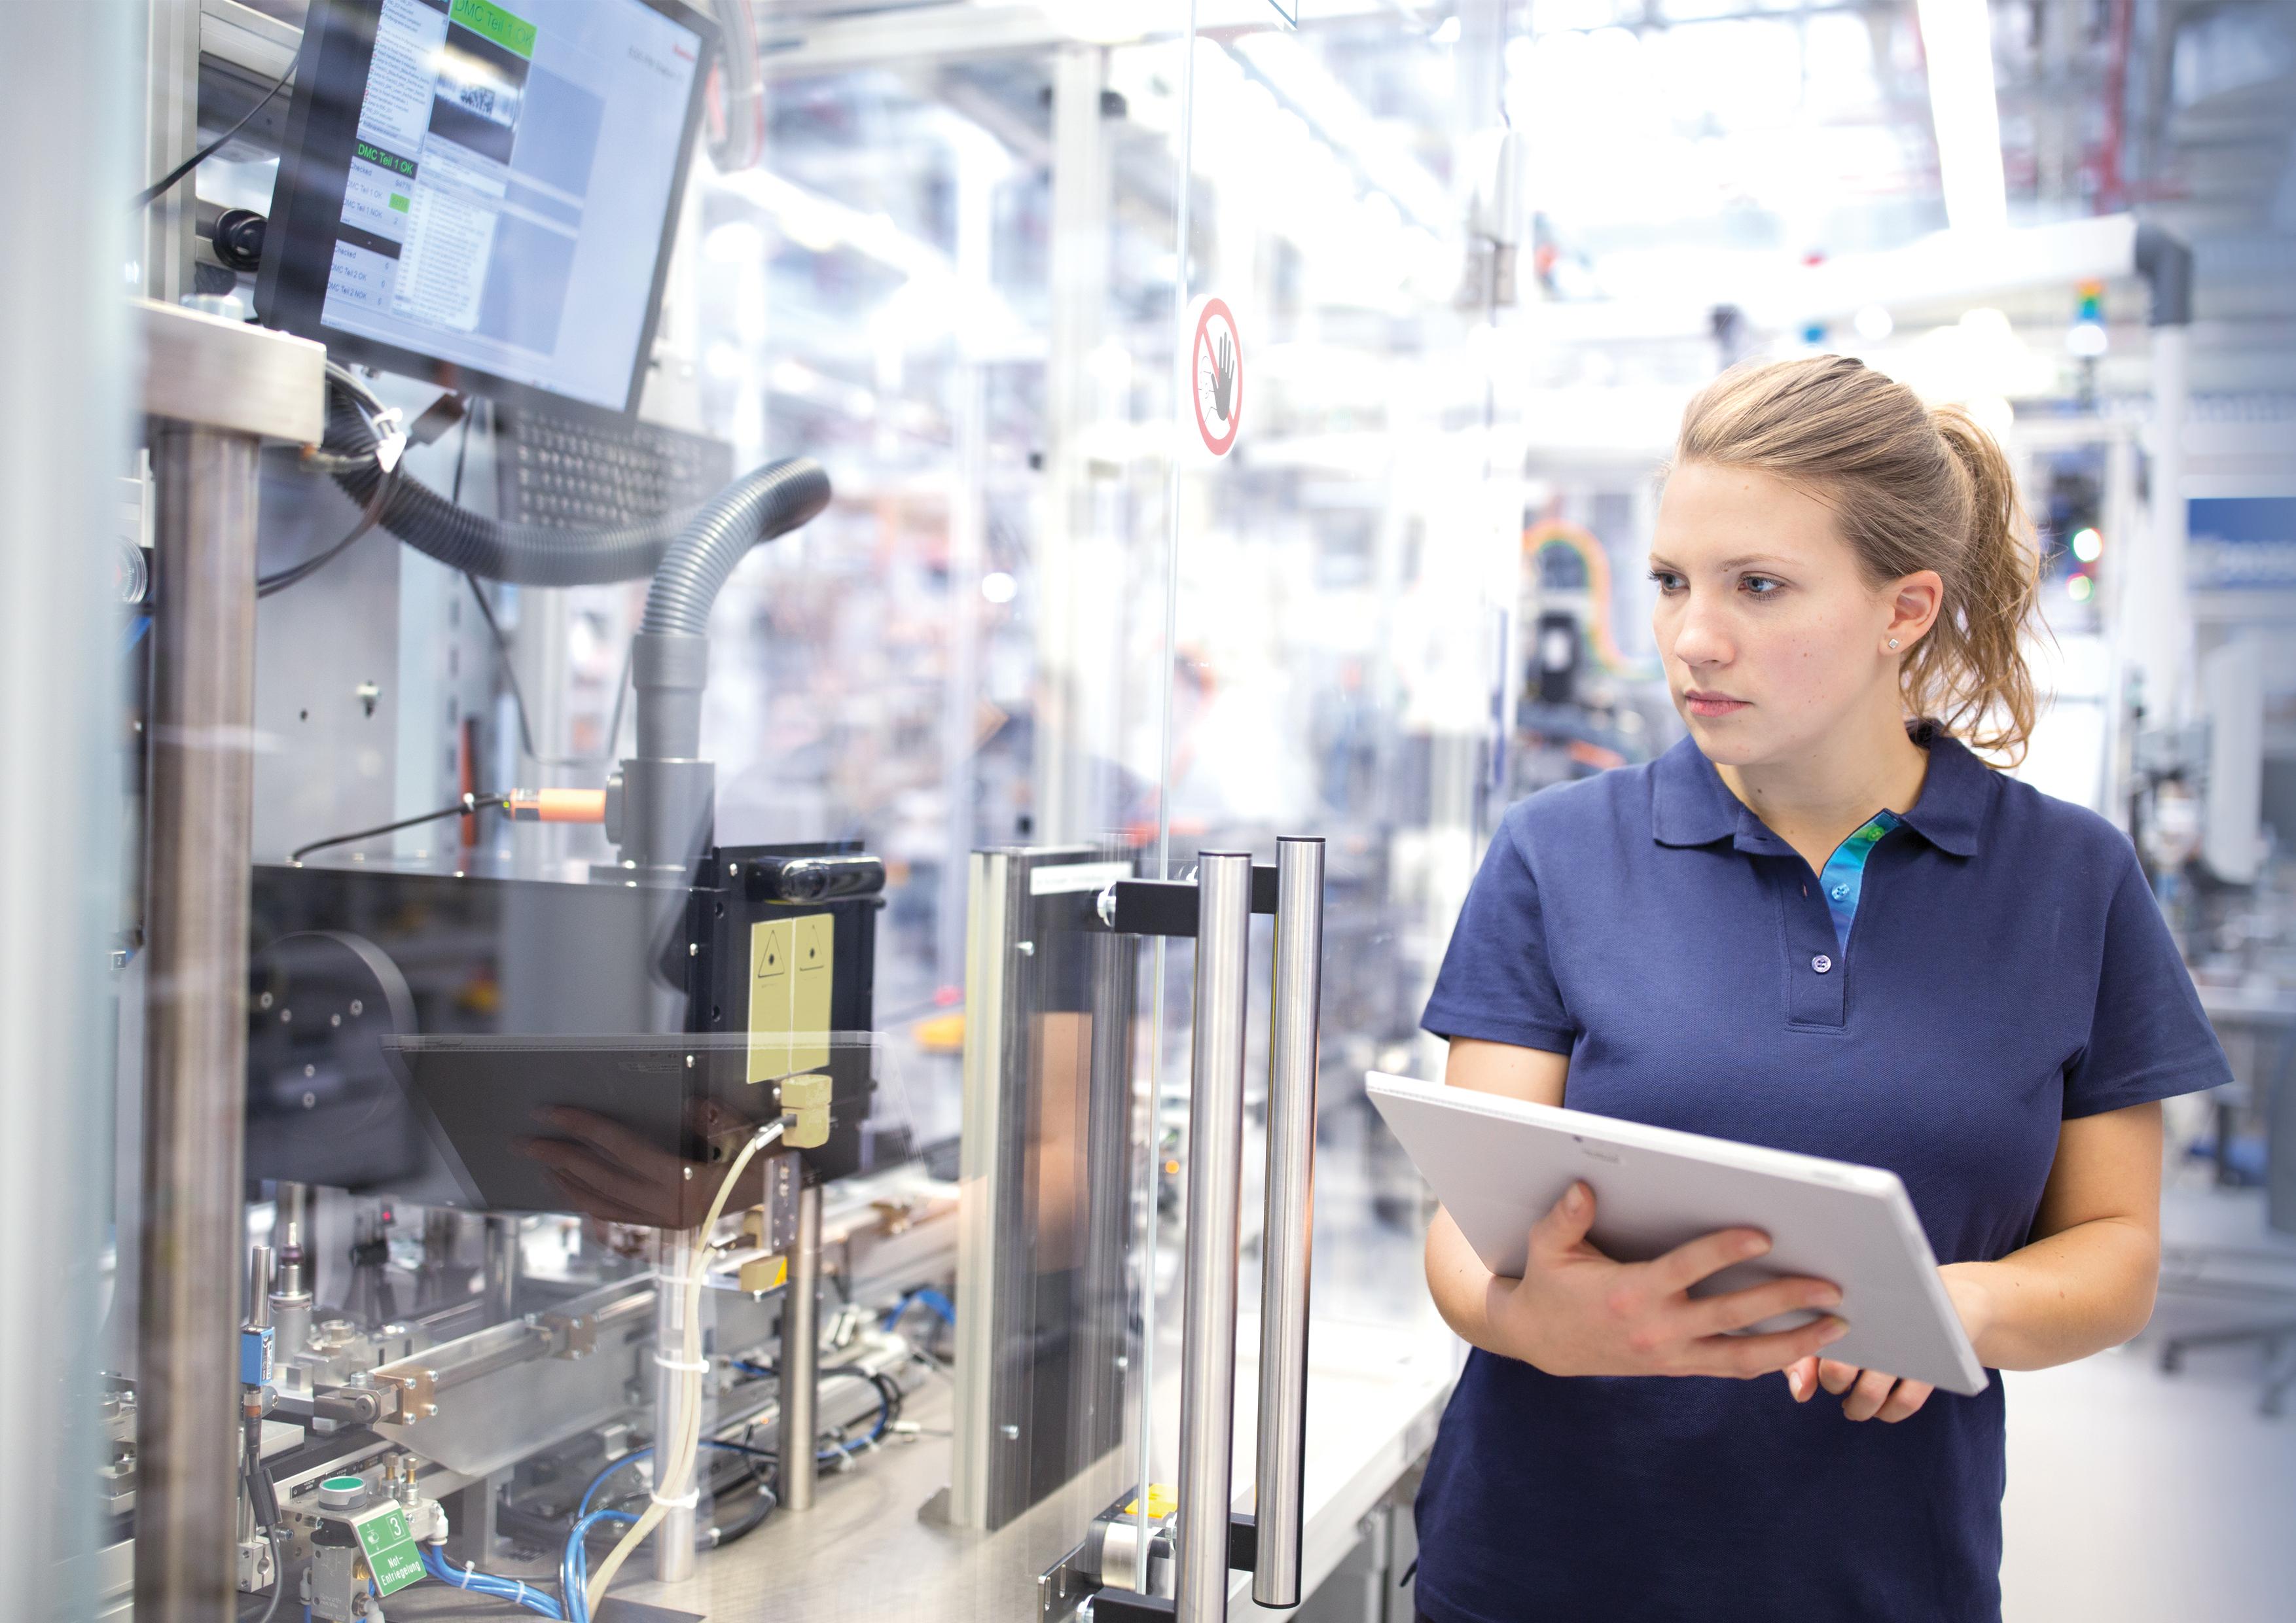 Industrie 4.0 bei Bosch